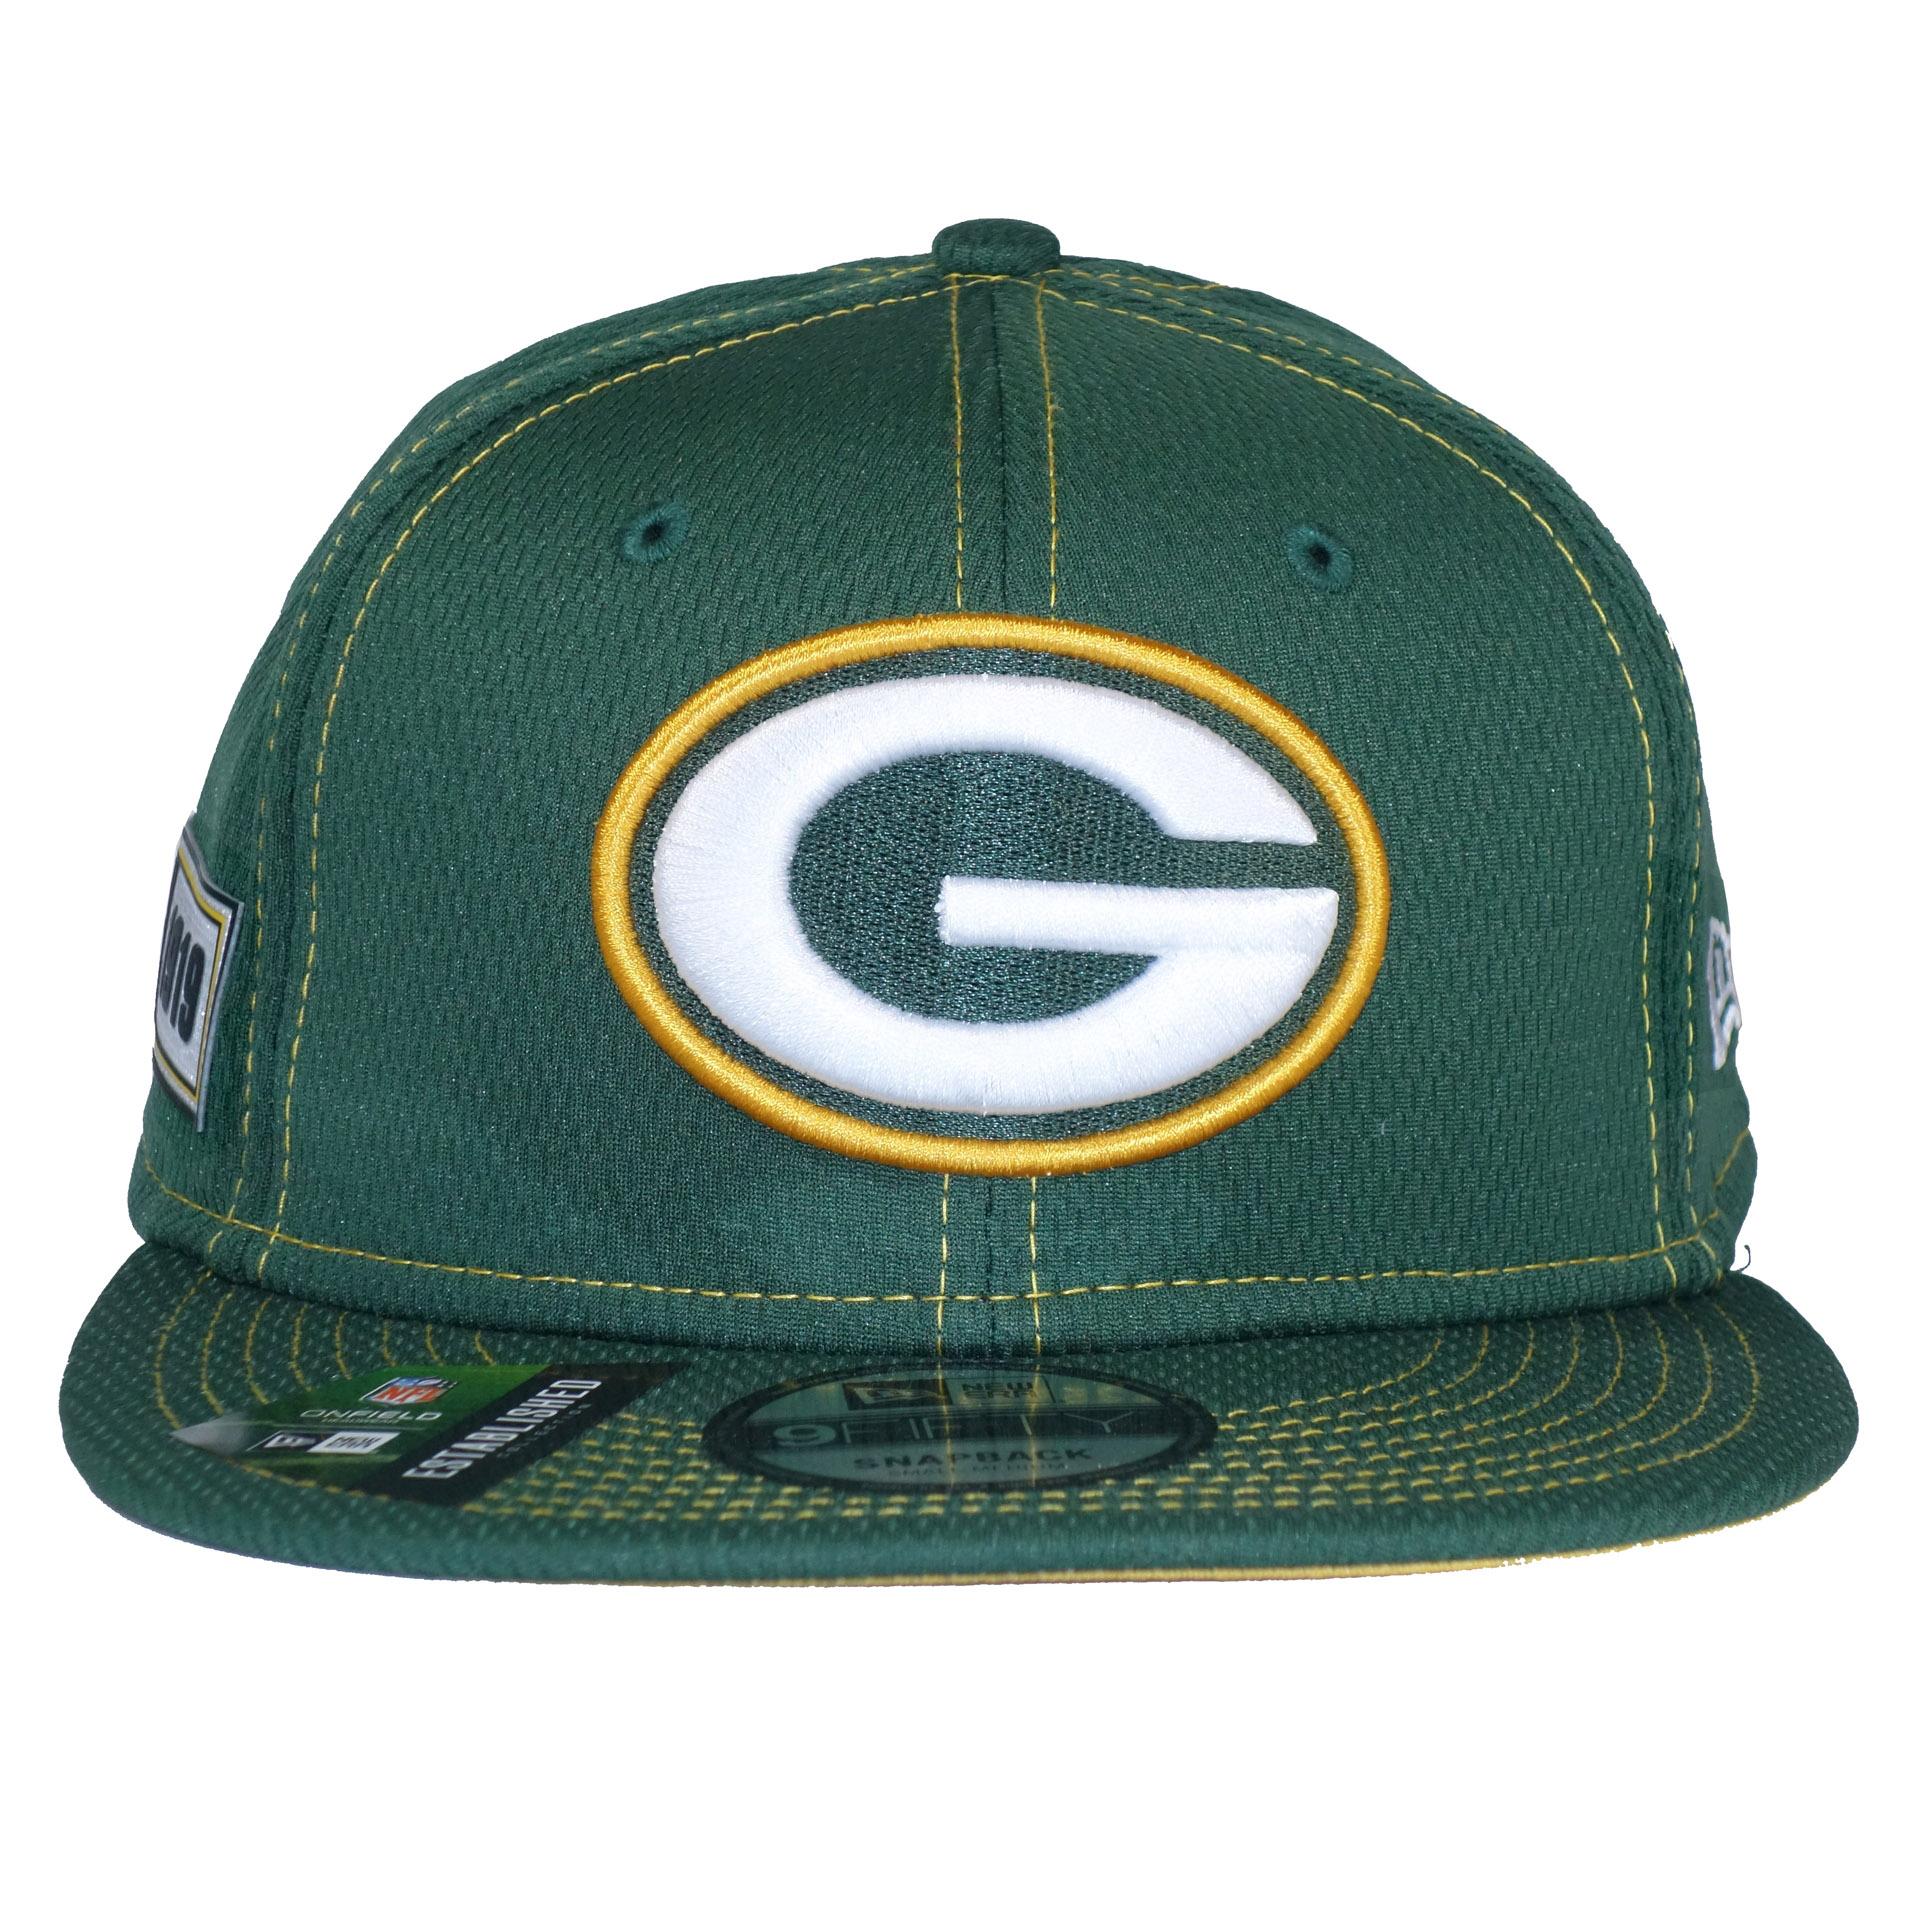 NFL New Era Cap SnapBack Green Day Packers